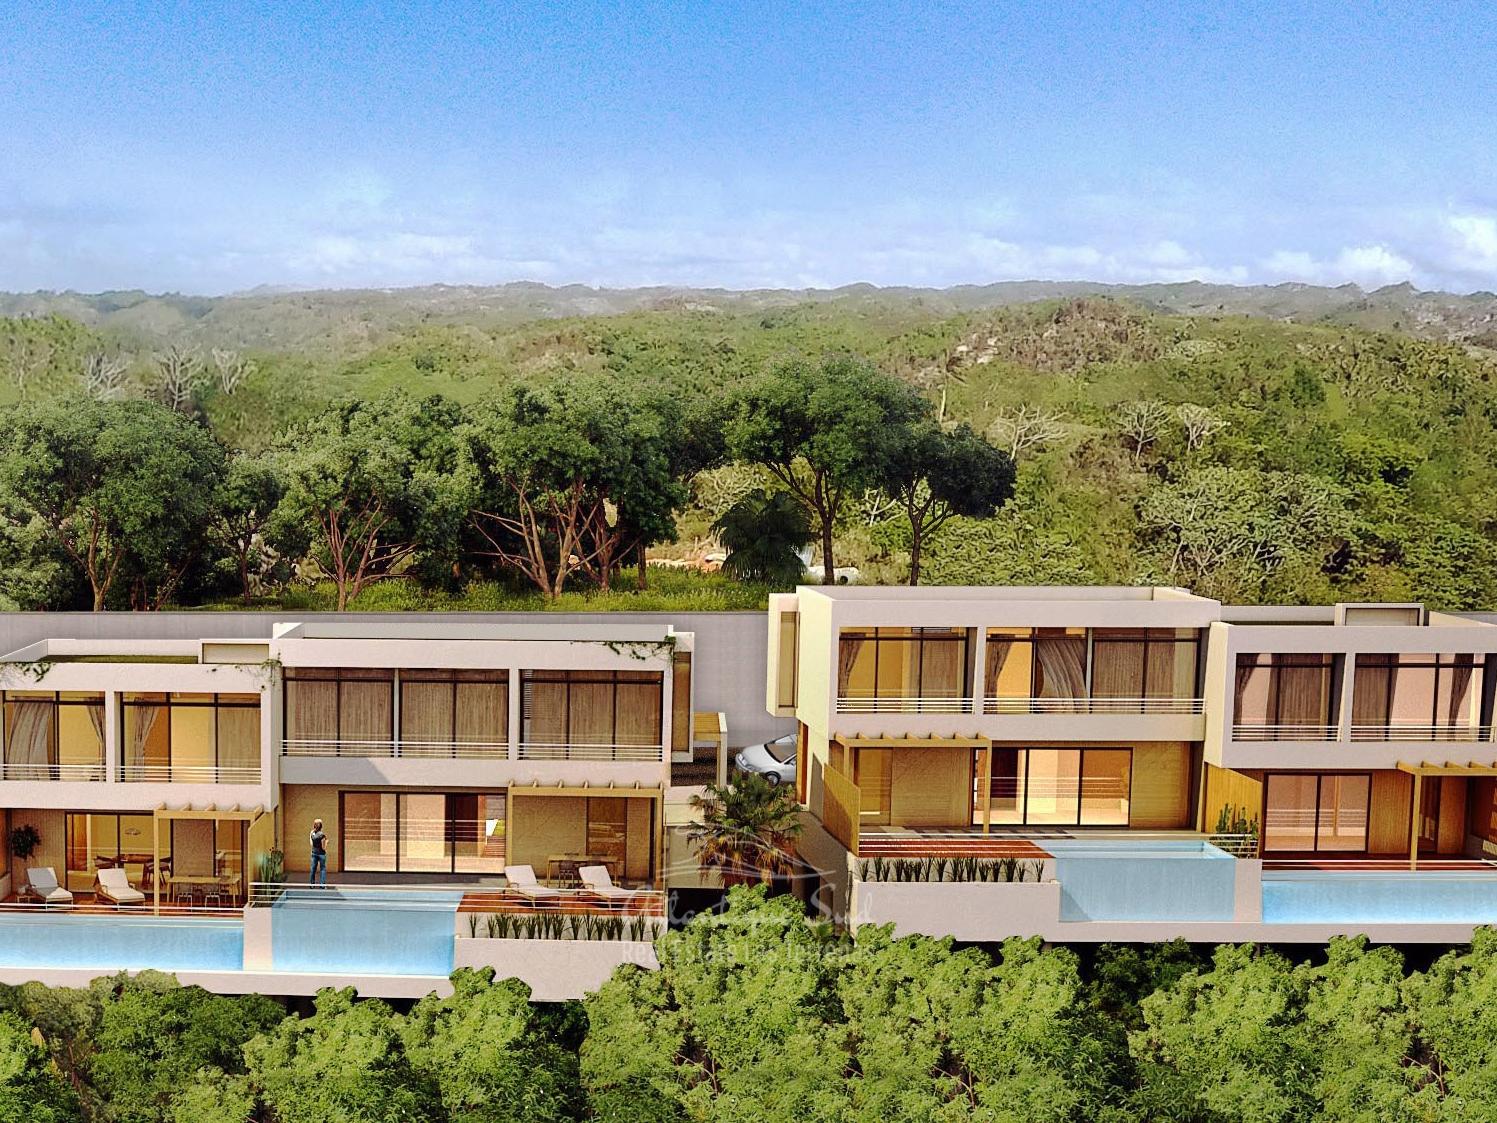 Hillside Townhouses with amazing ocean views in Las Terrenas Real Estate Dominican Republic1 (1).jpg